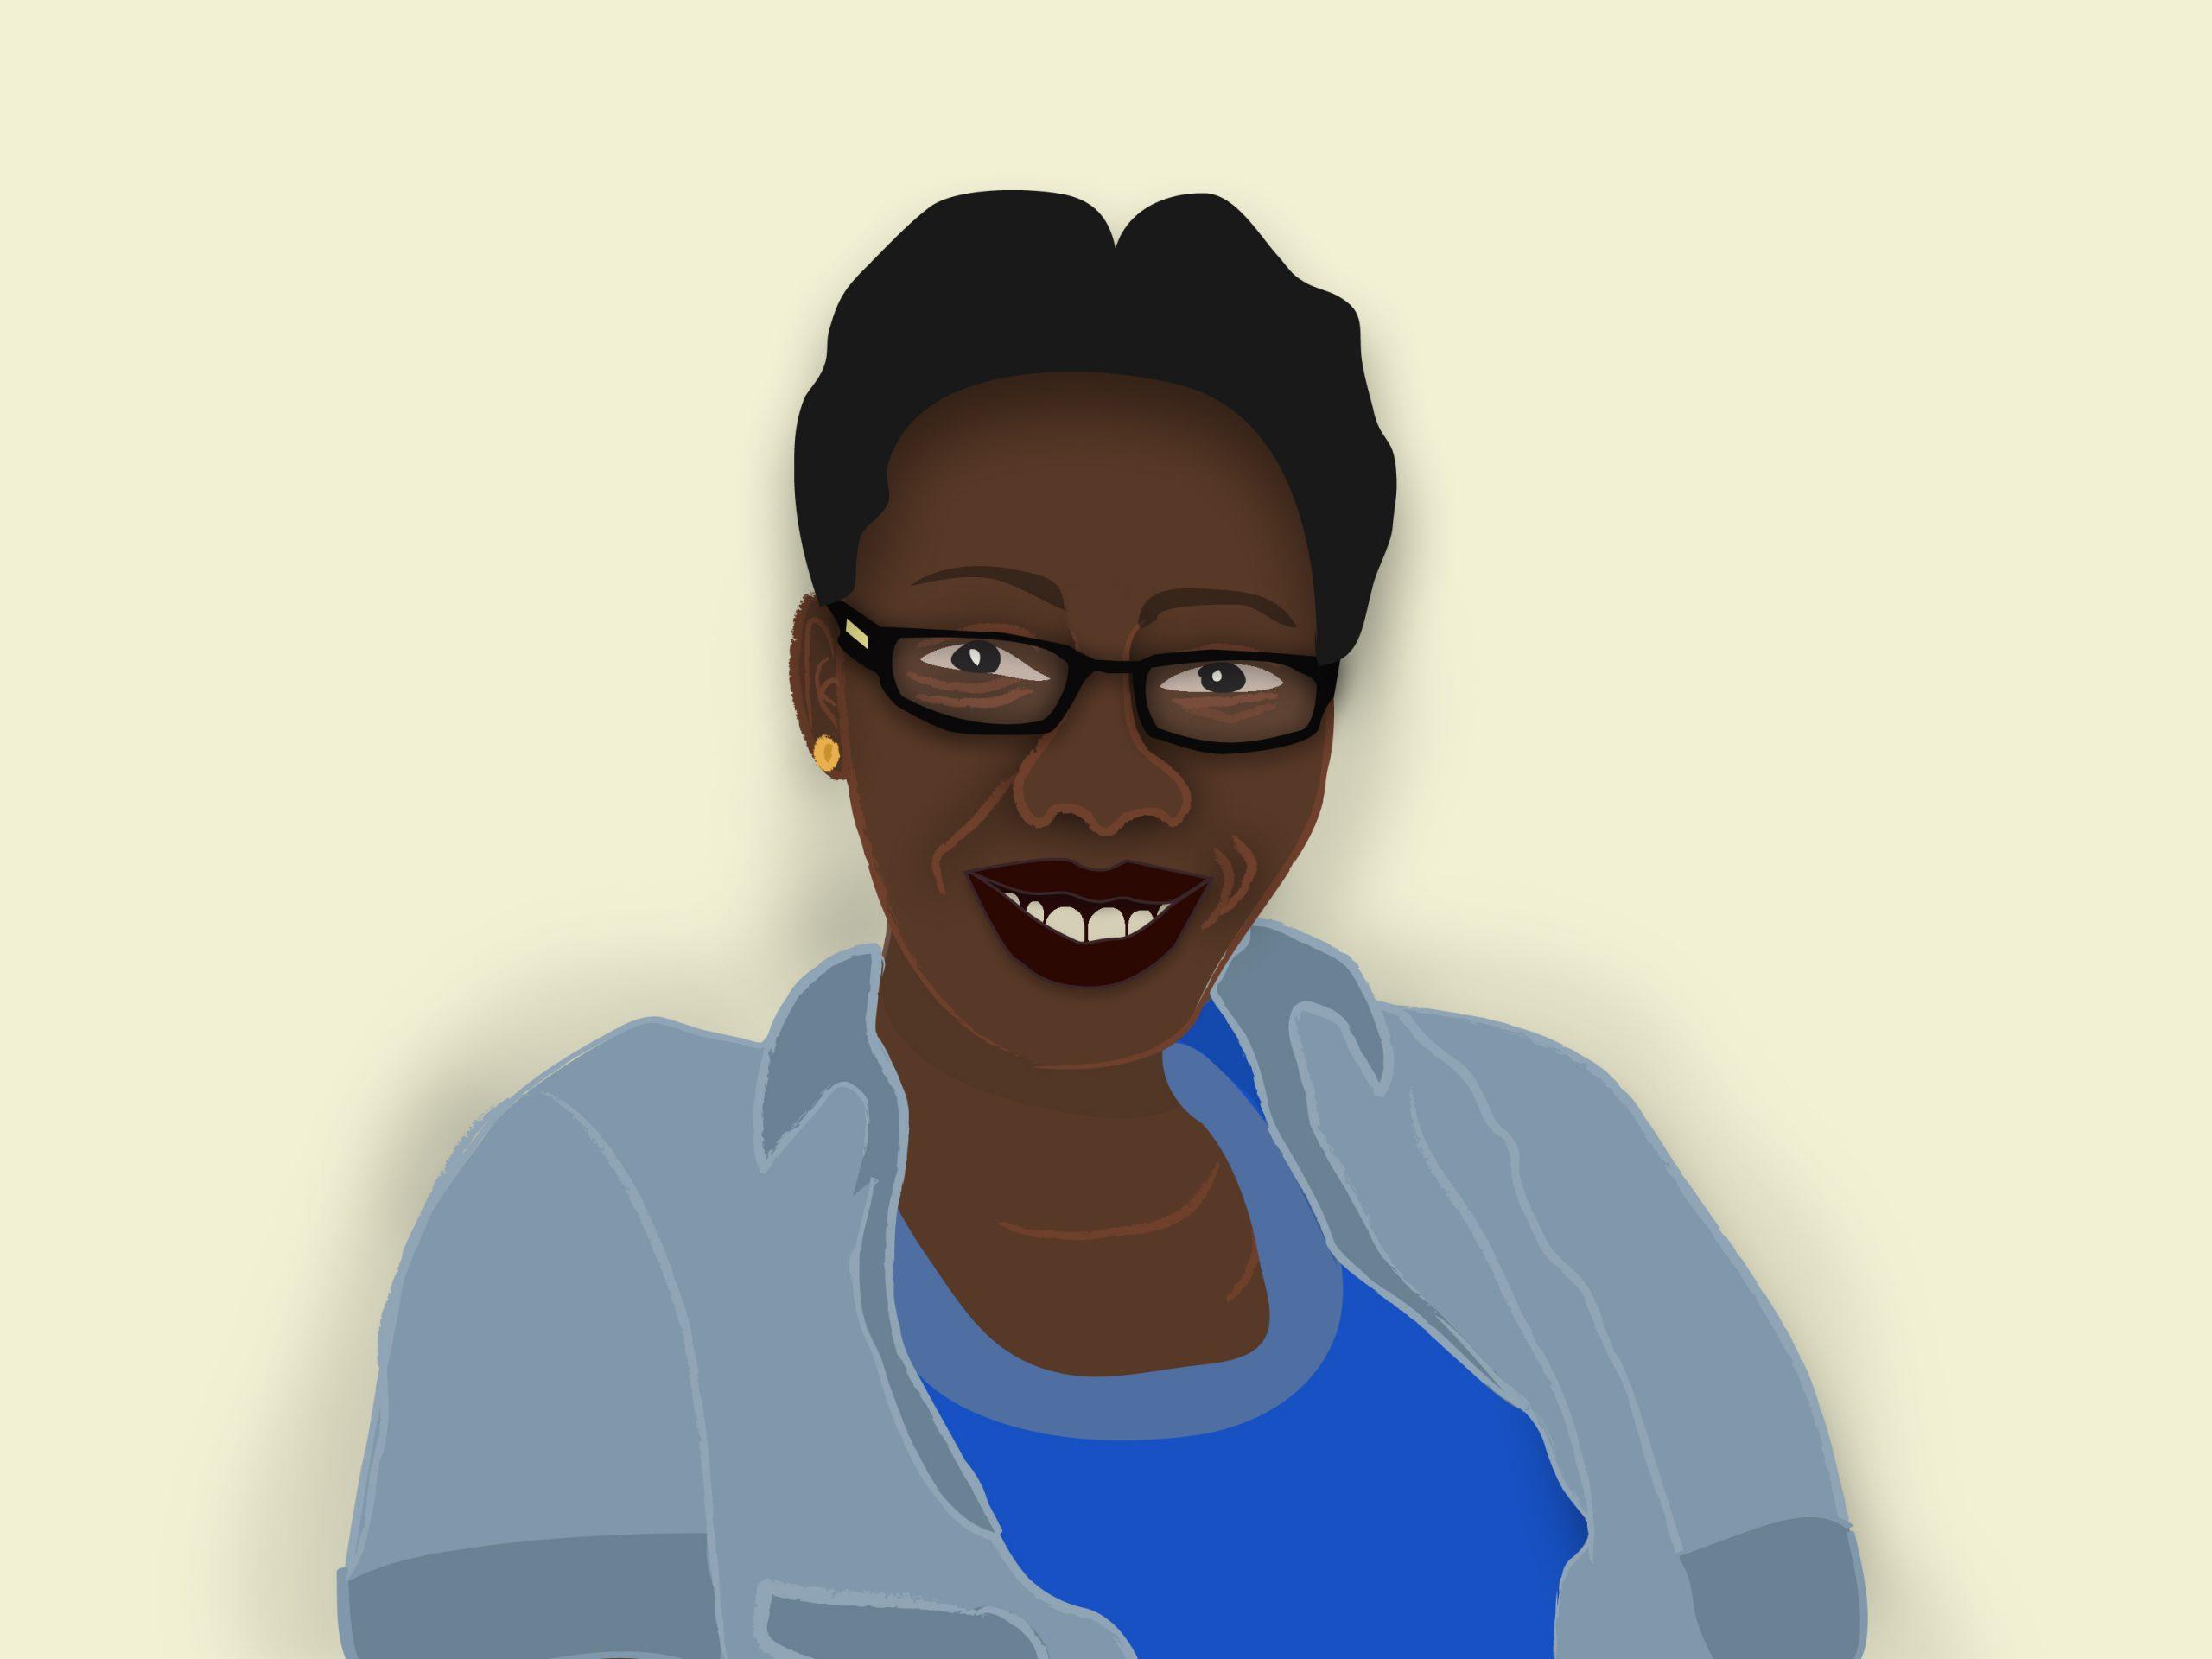 Self-portrait illustration of the artist Doreen Edemafaka